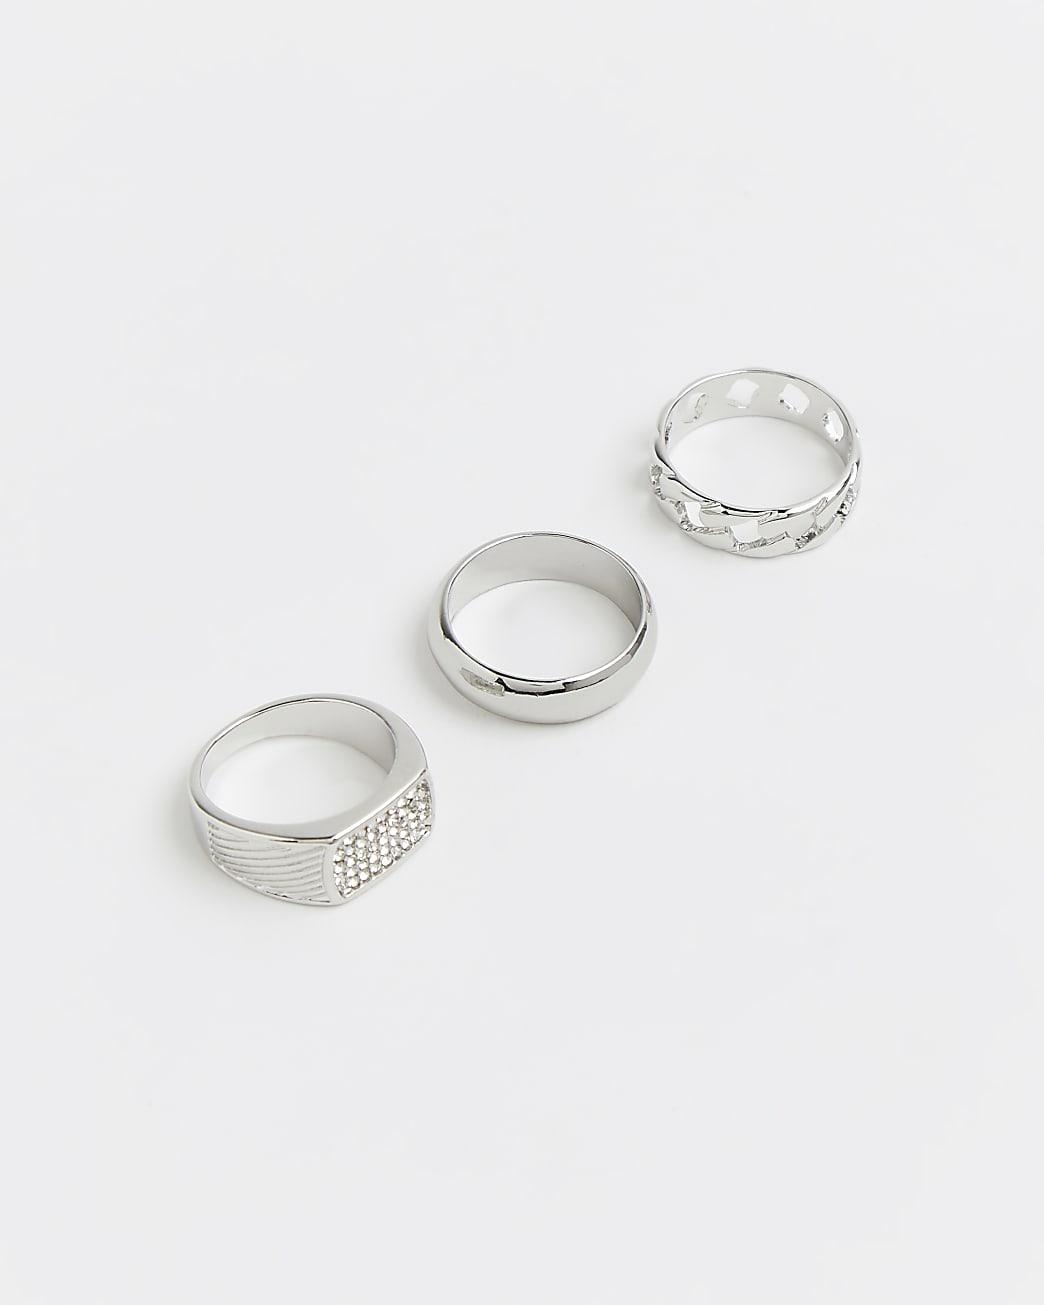 Silver diamante rings 3 pack